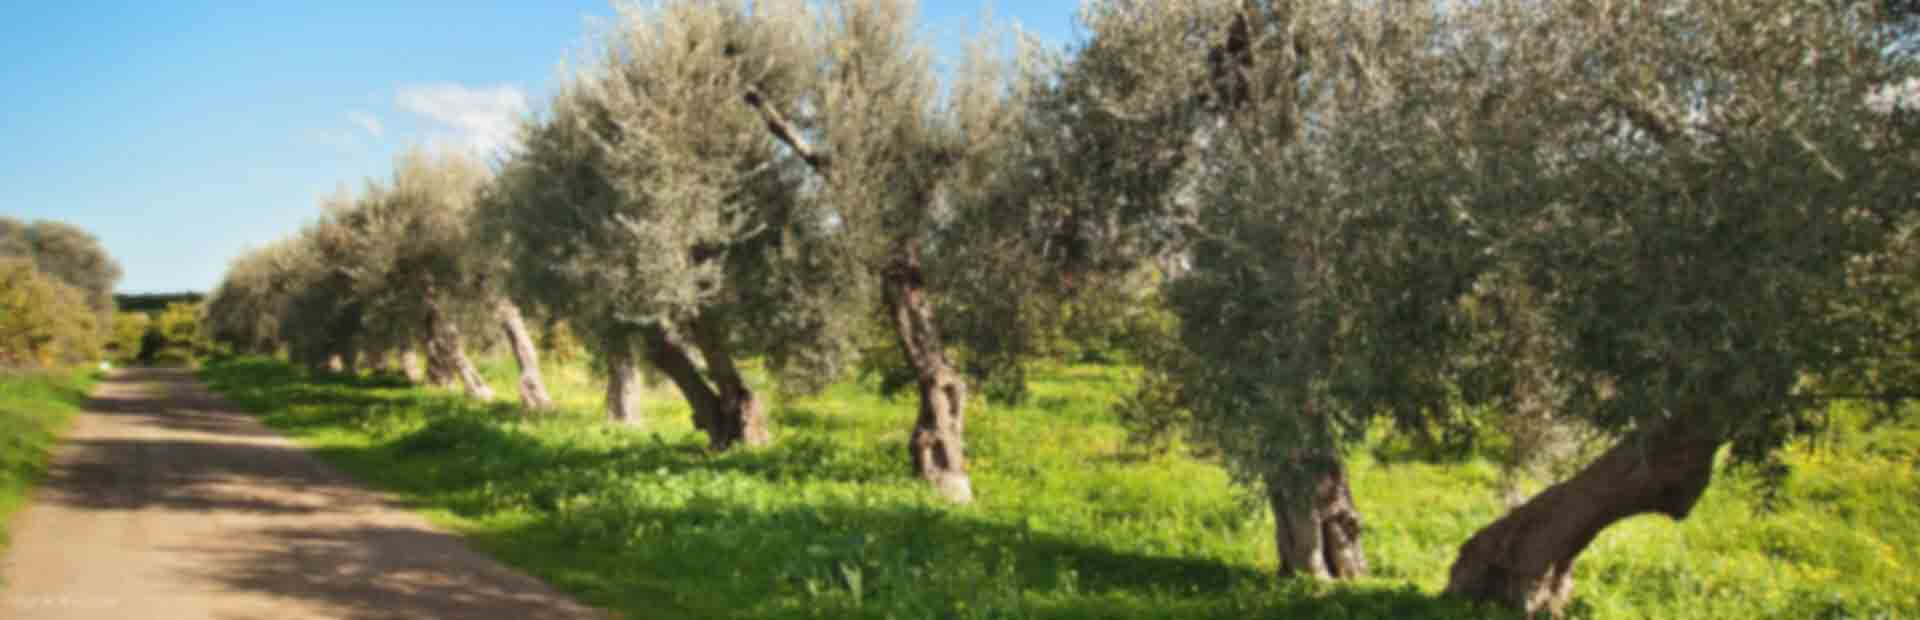 Agroturystyka Sycylia